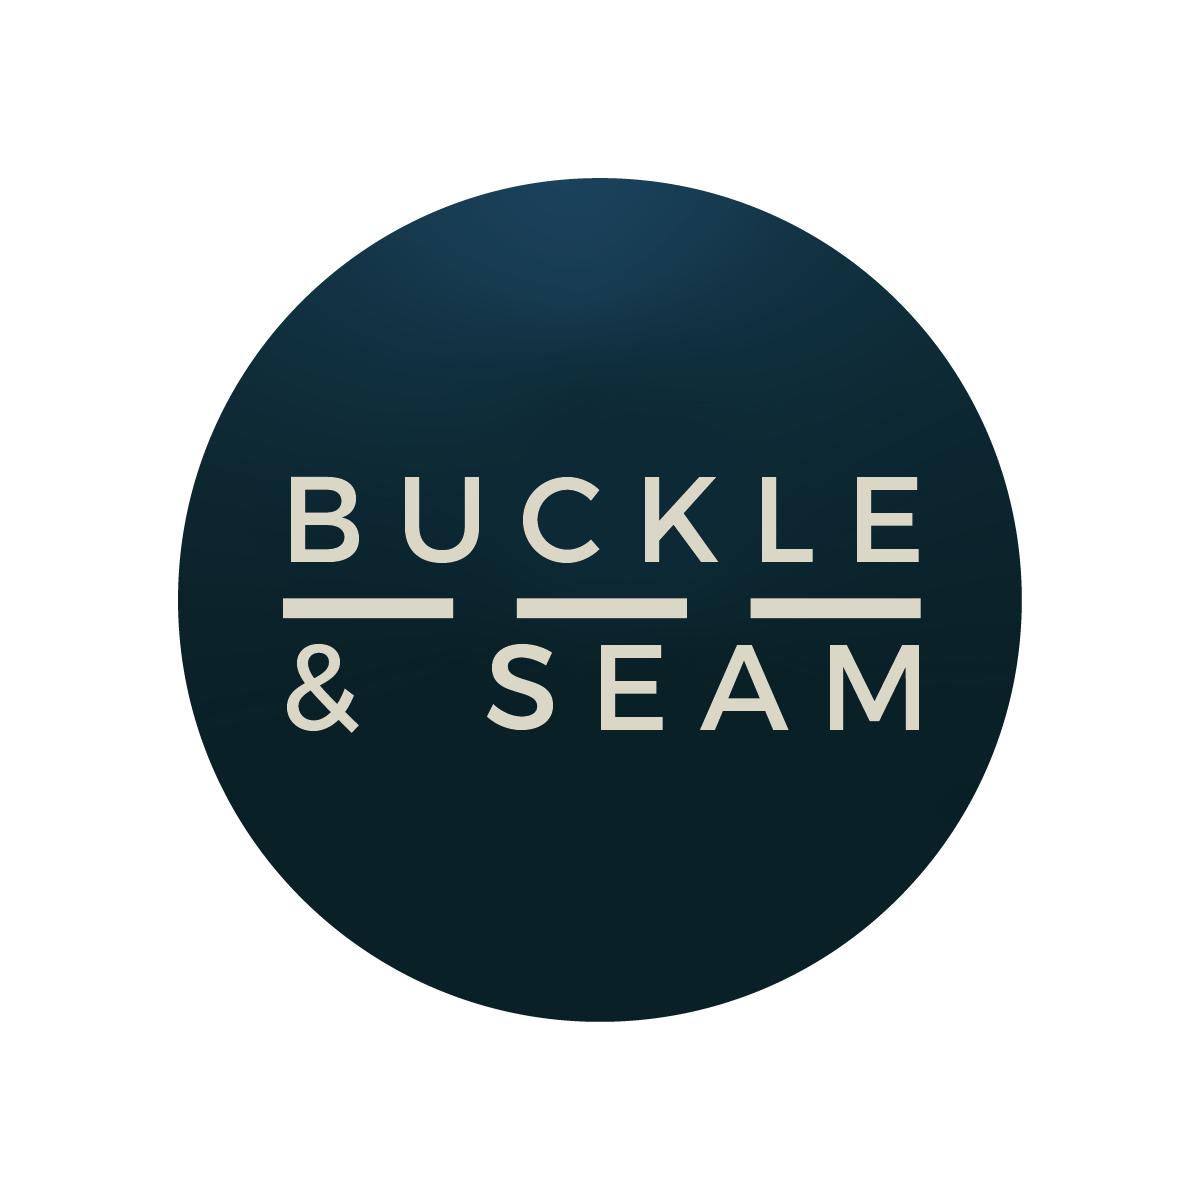 Buckle&Seam